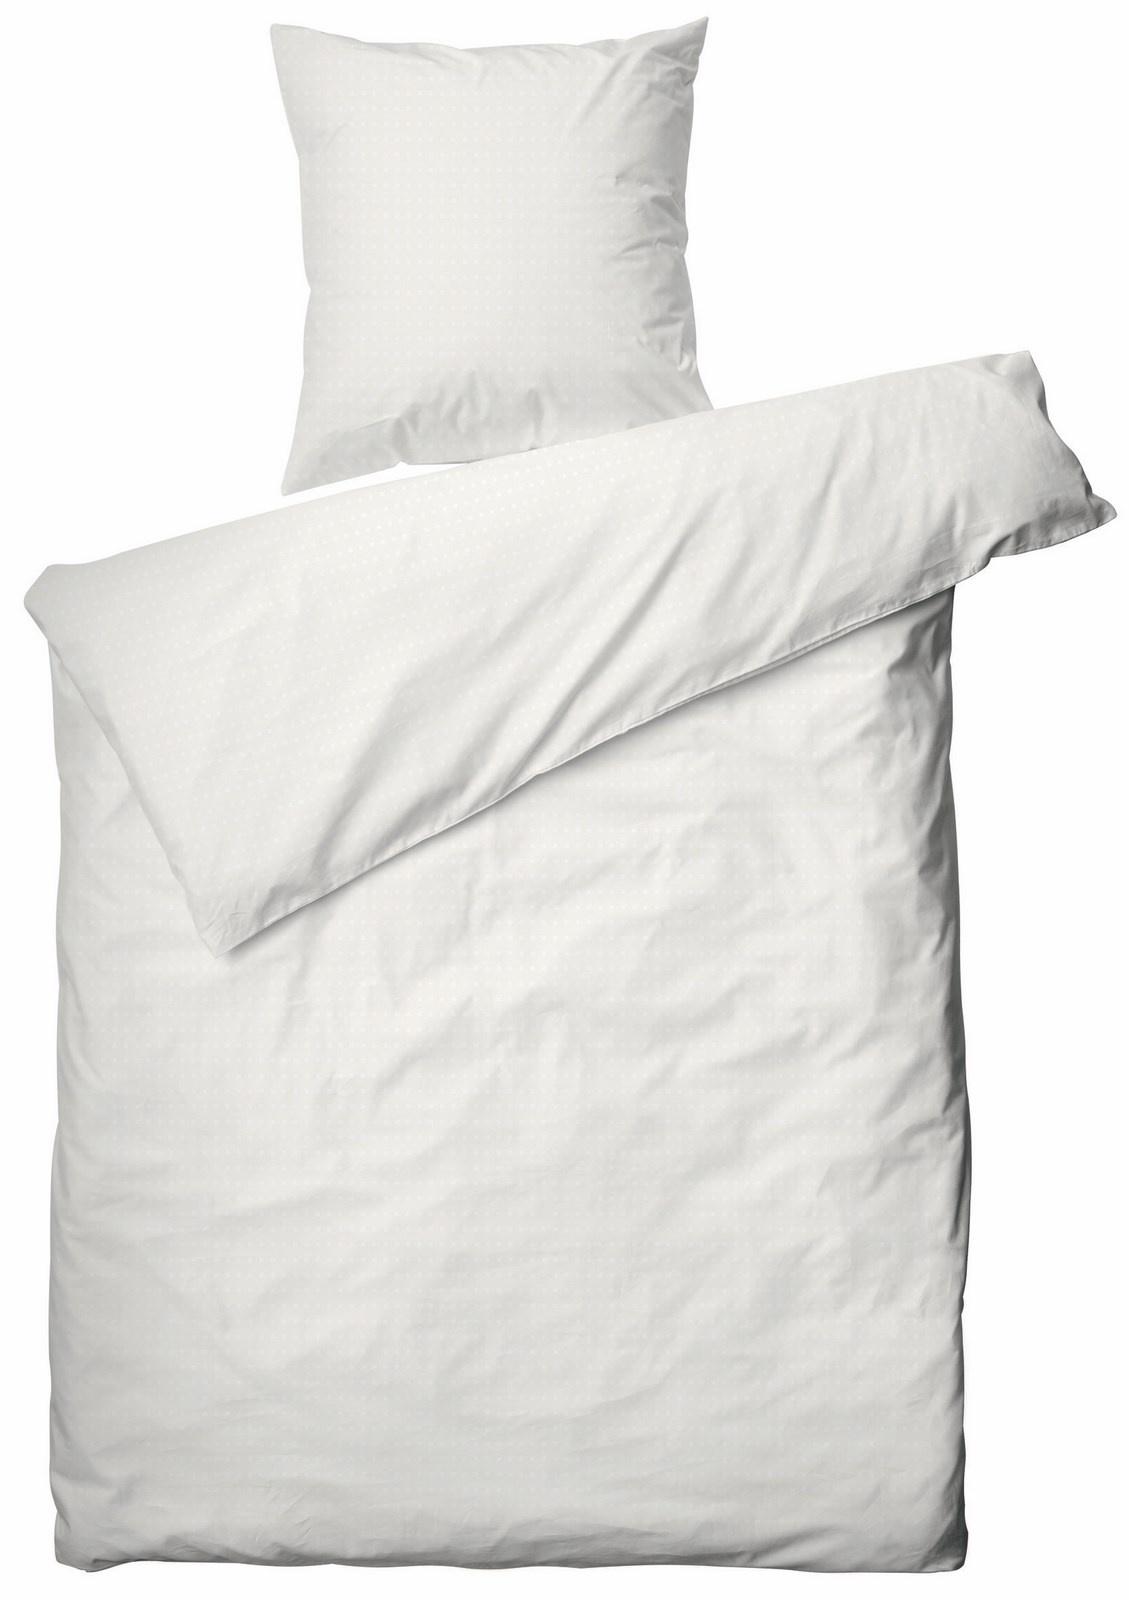 Juna Cube sengelinned, 140x200 cm, hvid